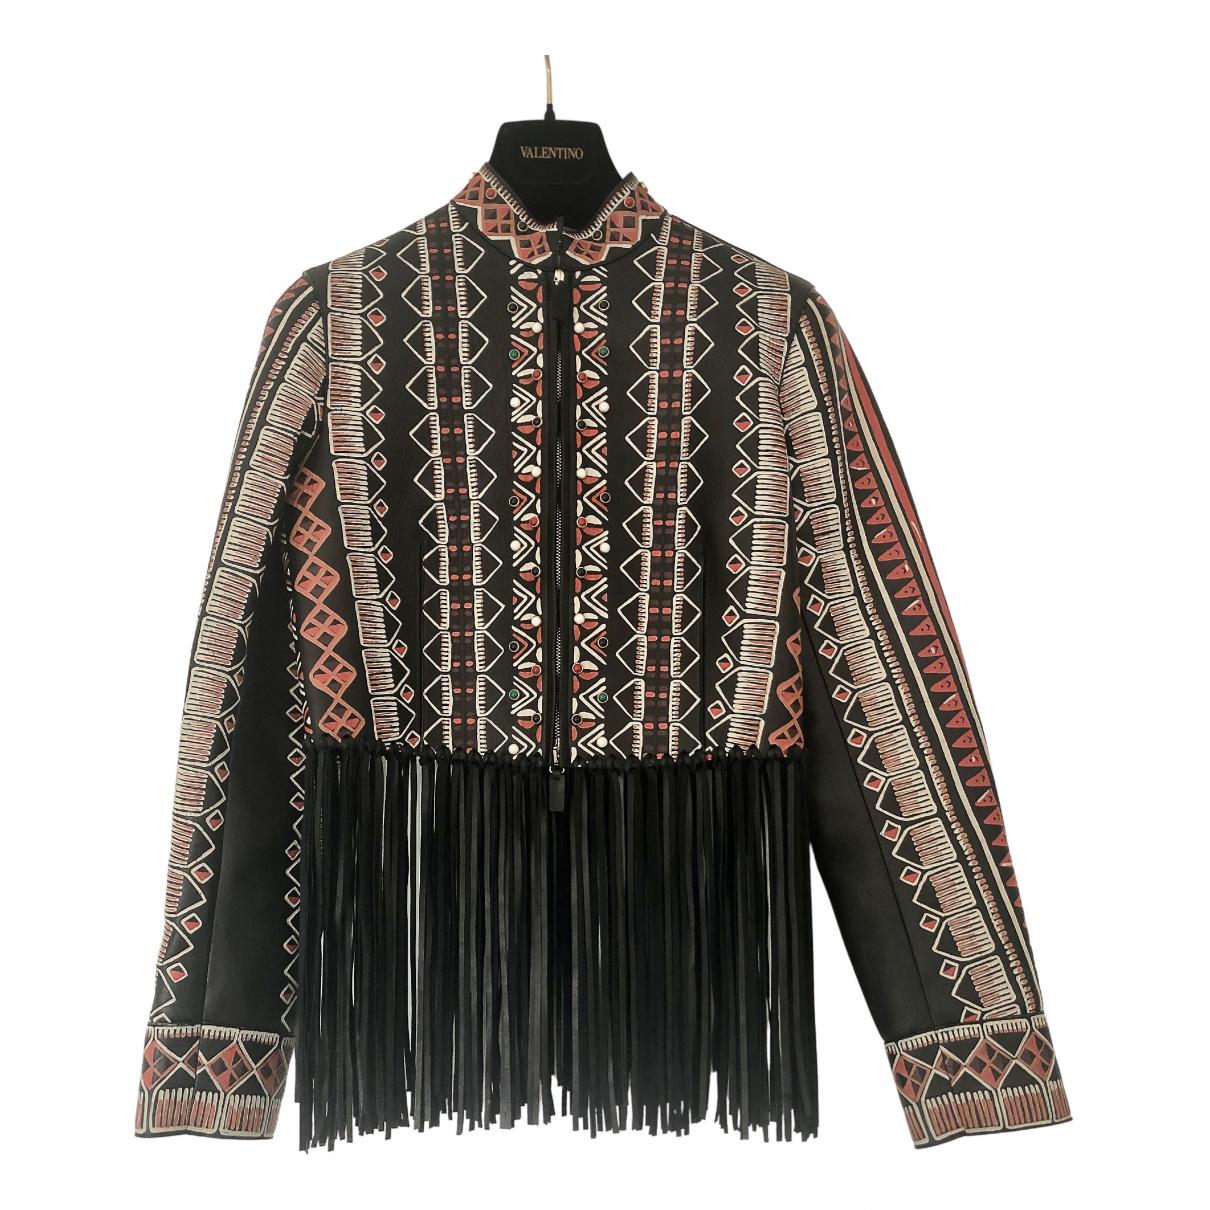 Valentino Garavani - Veste   pour femme en cuir - multicolore